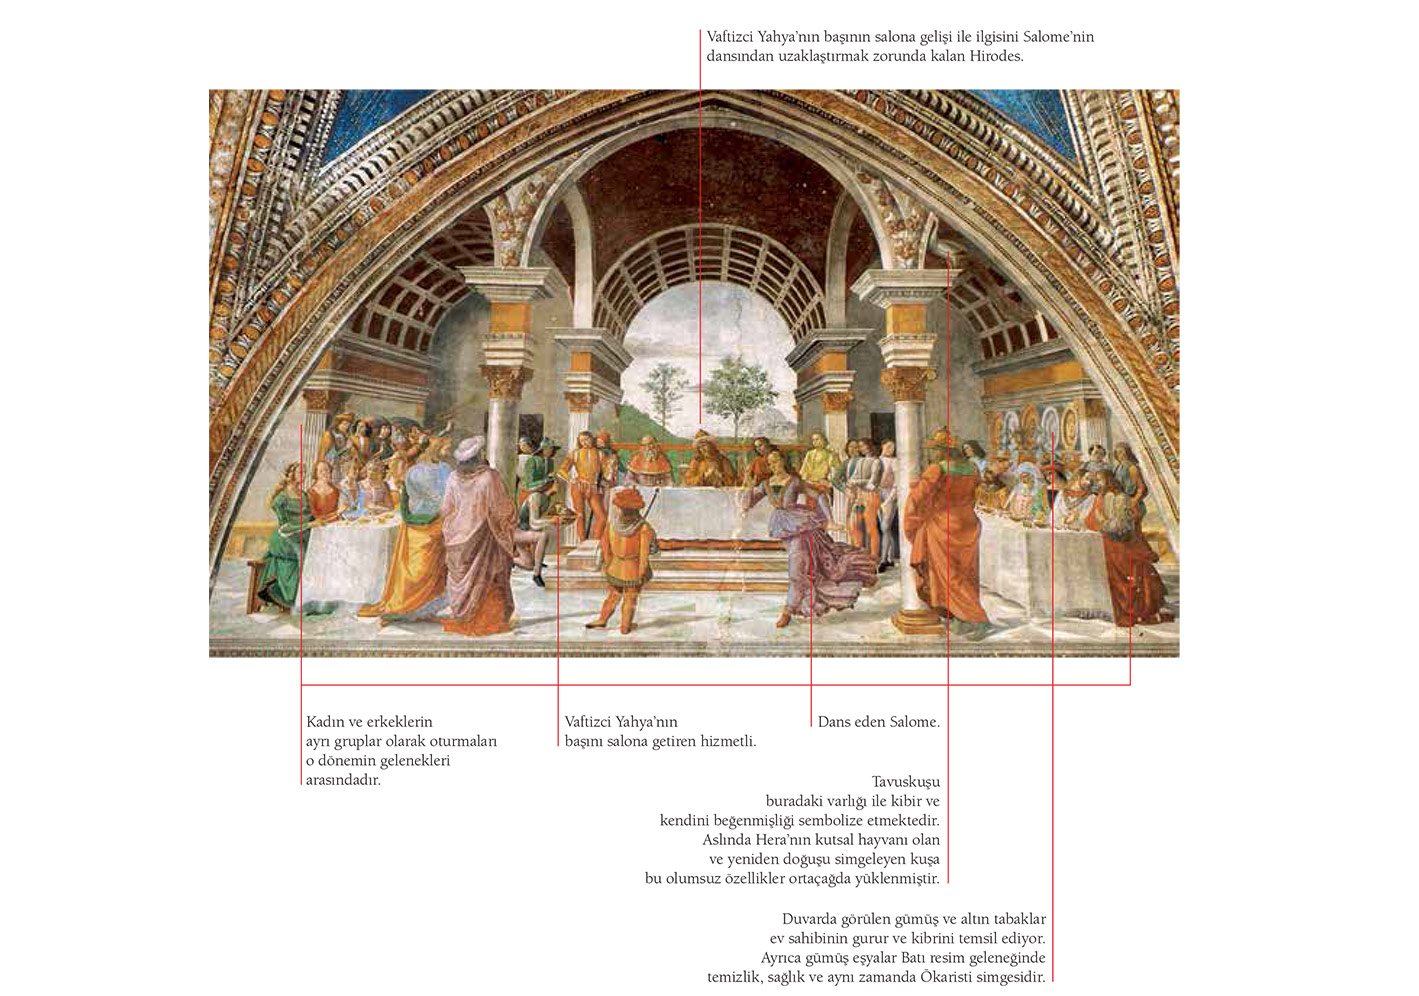 Domenico Ghirlandaio,Hirodes'in Ziyafeti, 1486-90, fresk, 450 x 250 cm, Cappella Tornabuoni, Santa Maria Novella, Floransa